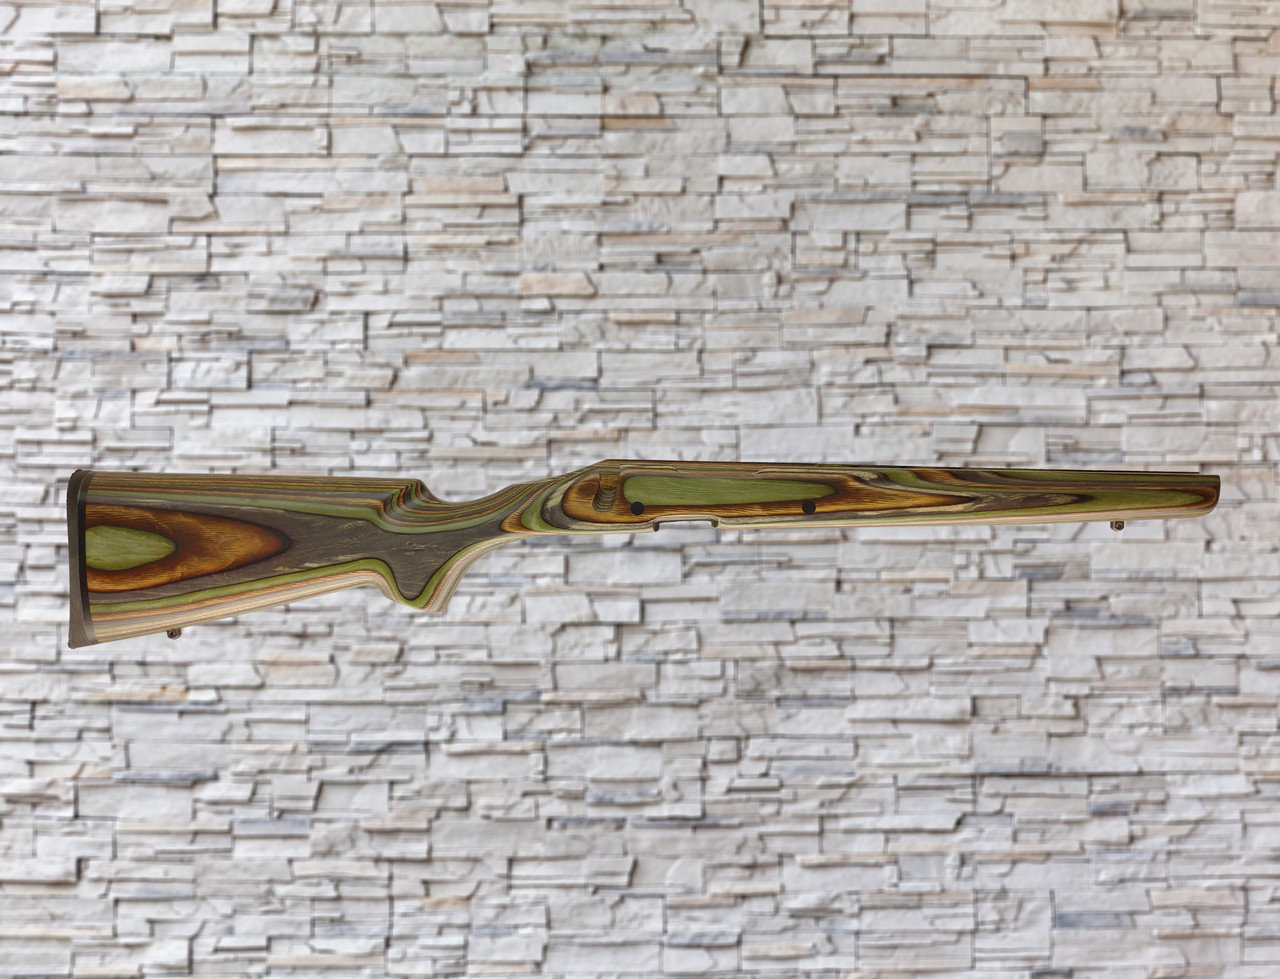 Boyds Classic Wood Stock Forest Camo For Remington 700 SA Factory Detachable Magazine Rifles